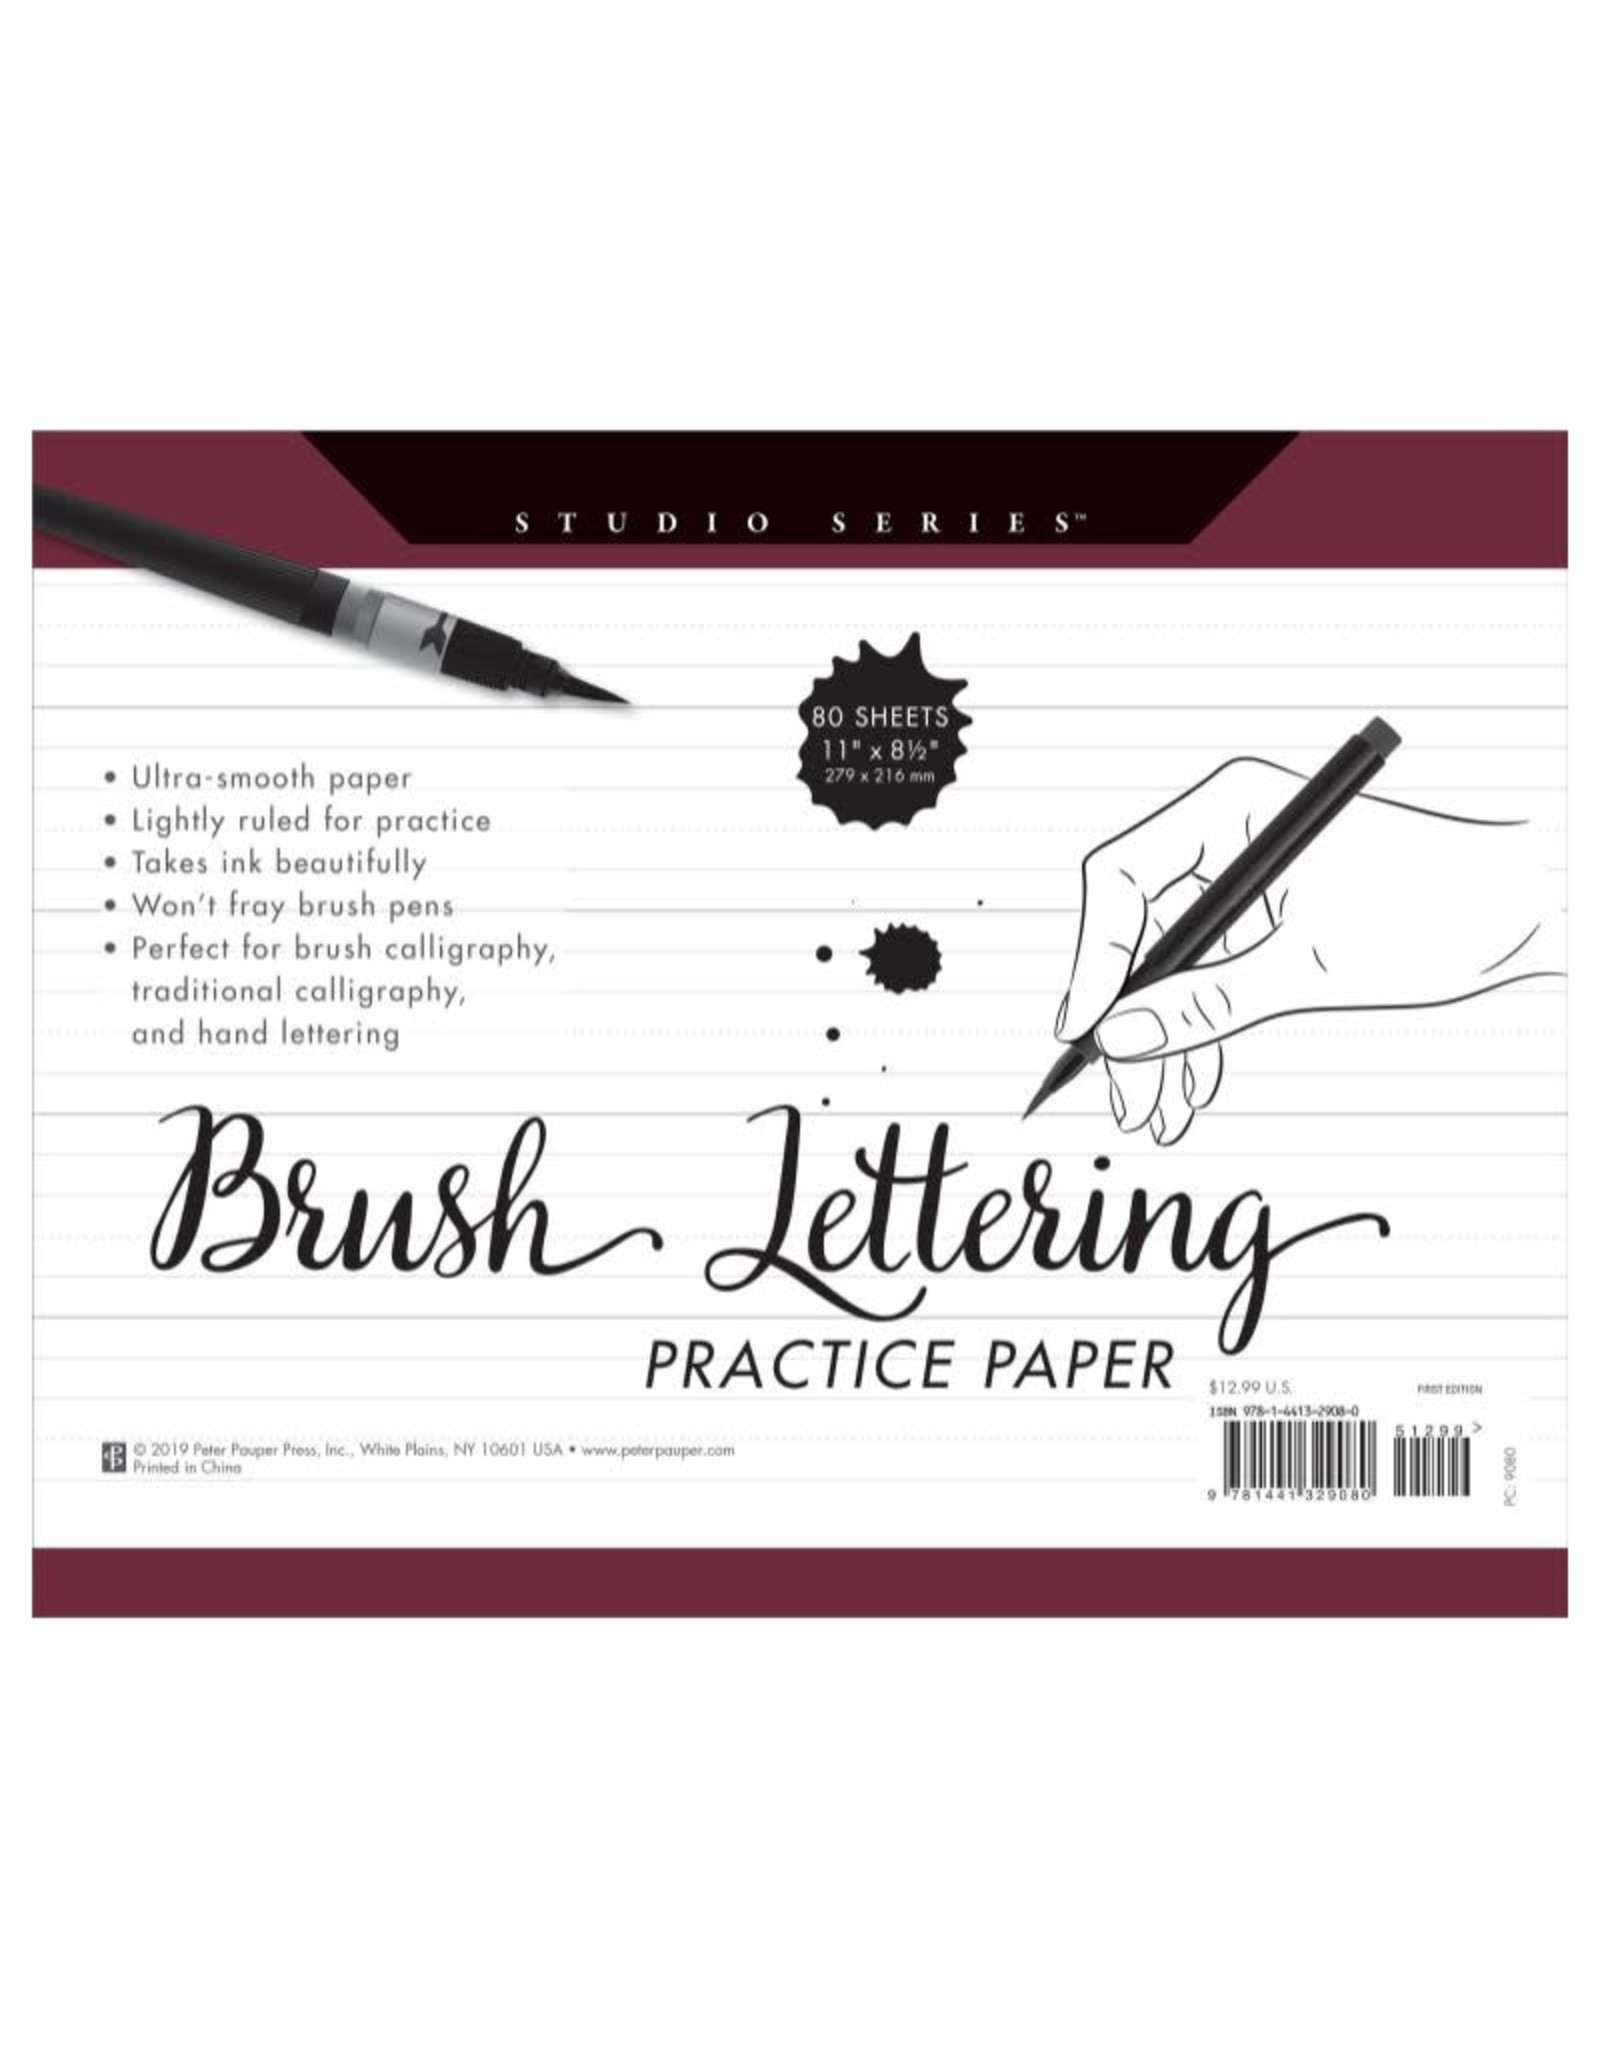 Peter Pauper Brush Lettering Practice Paper